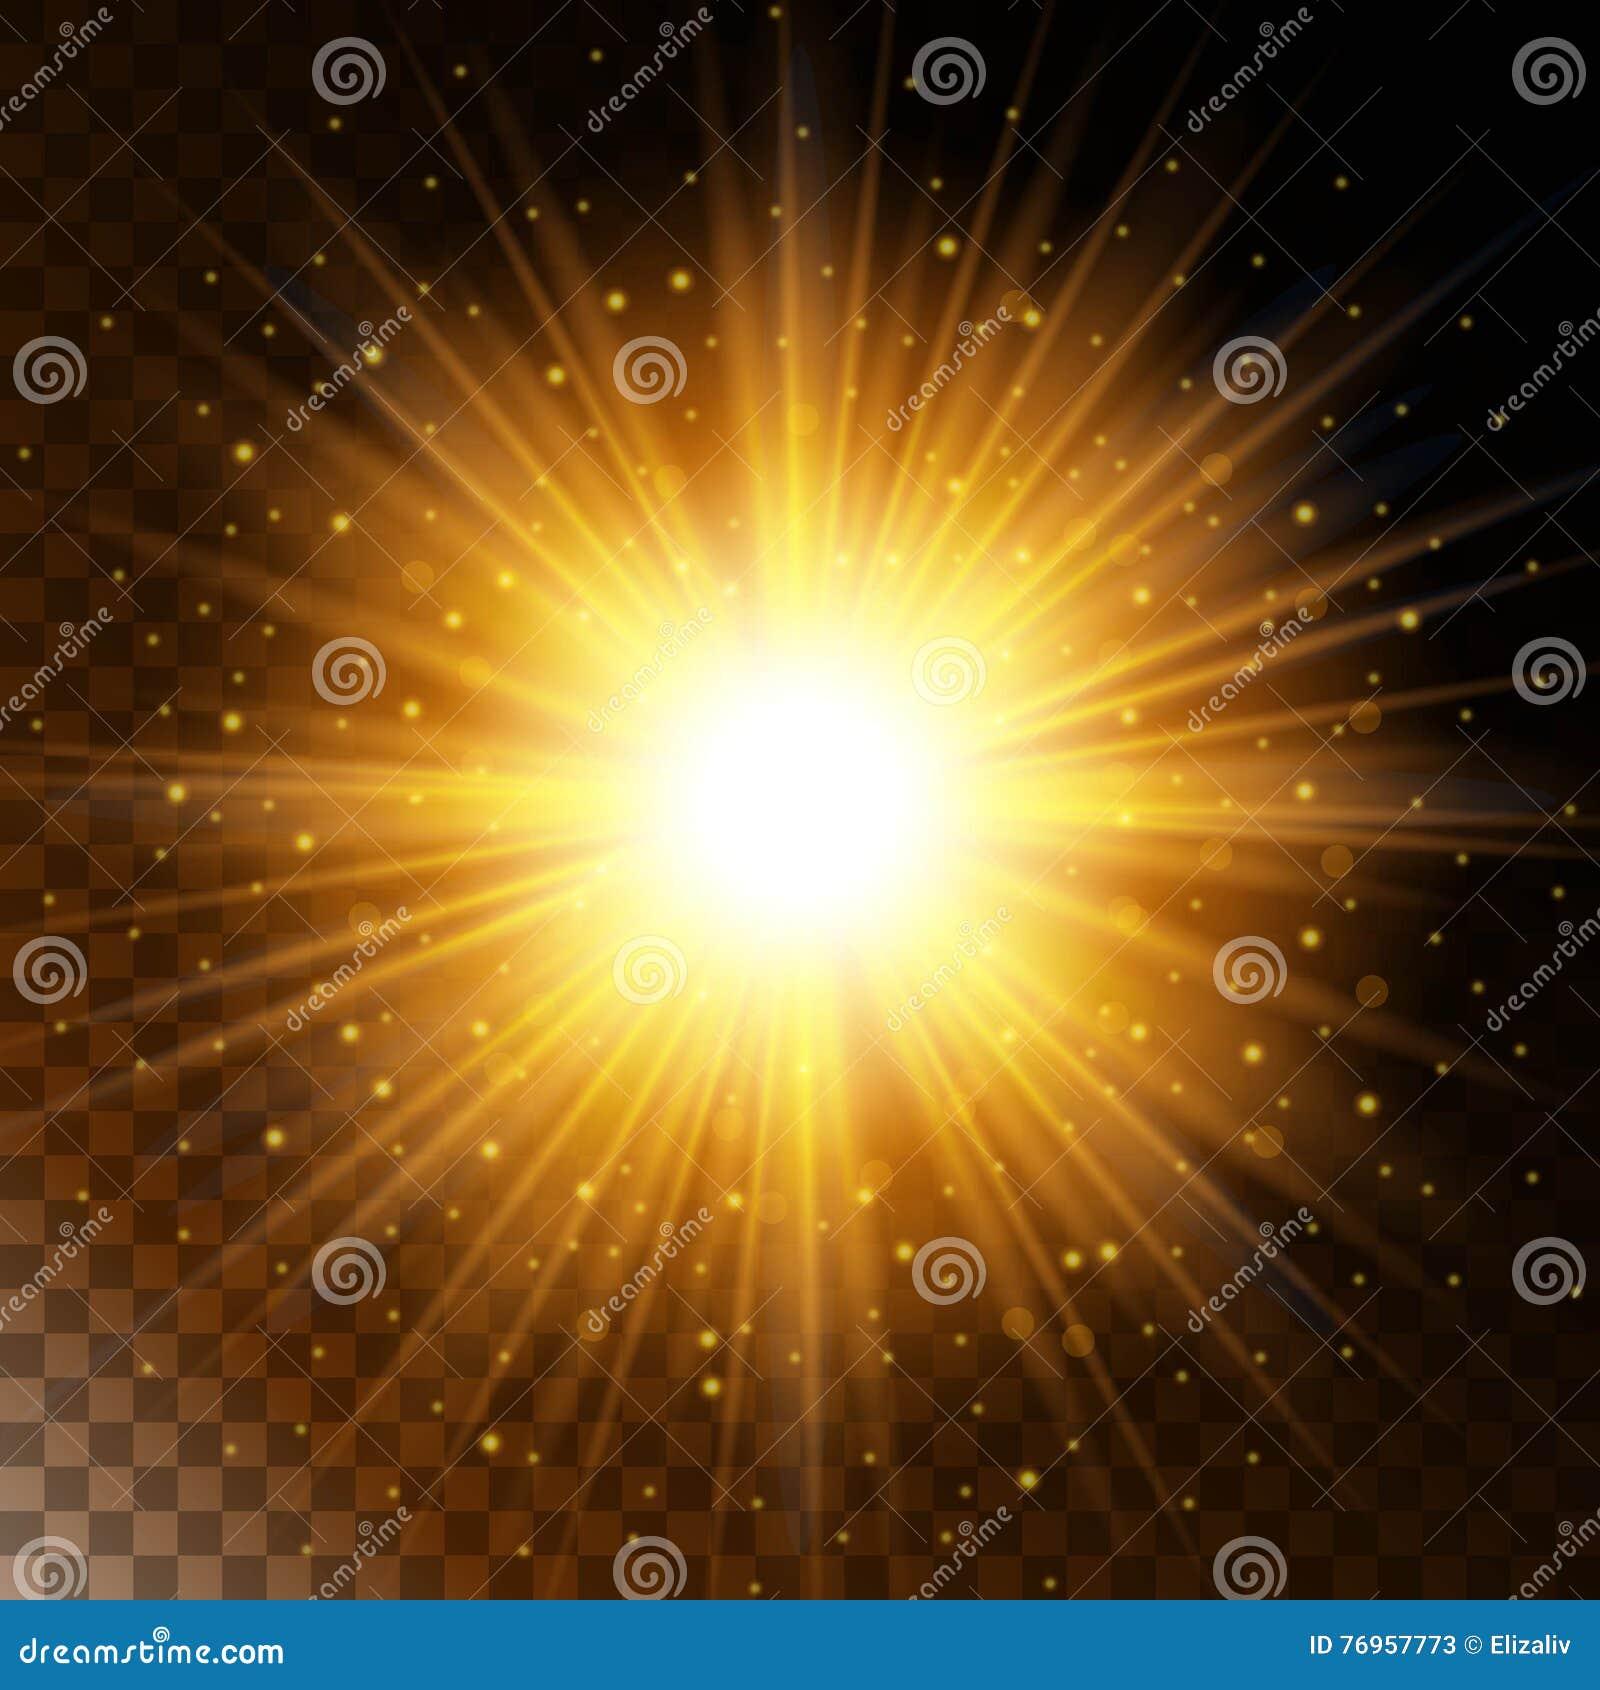 Set Of Glowing Light Effect Star, The Sunlight Warm Yellow Glow ... for Sun Light Effect Hd  557yll